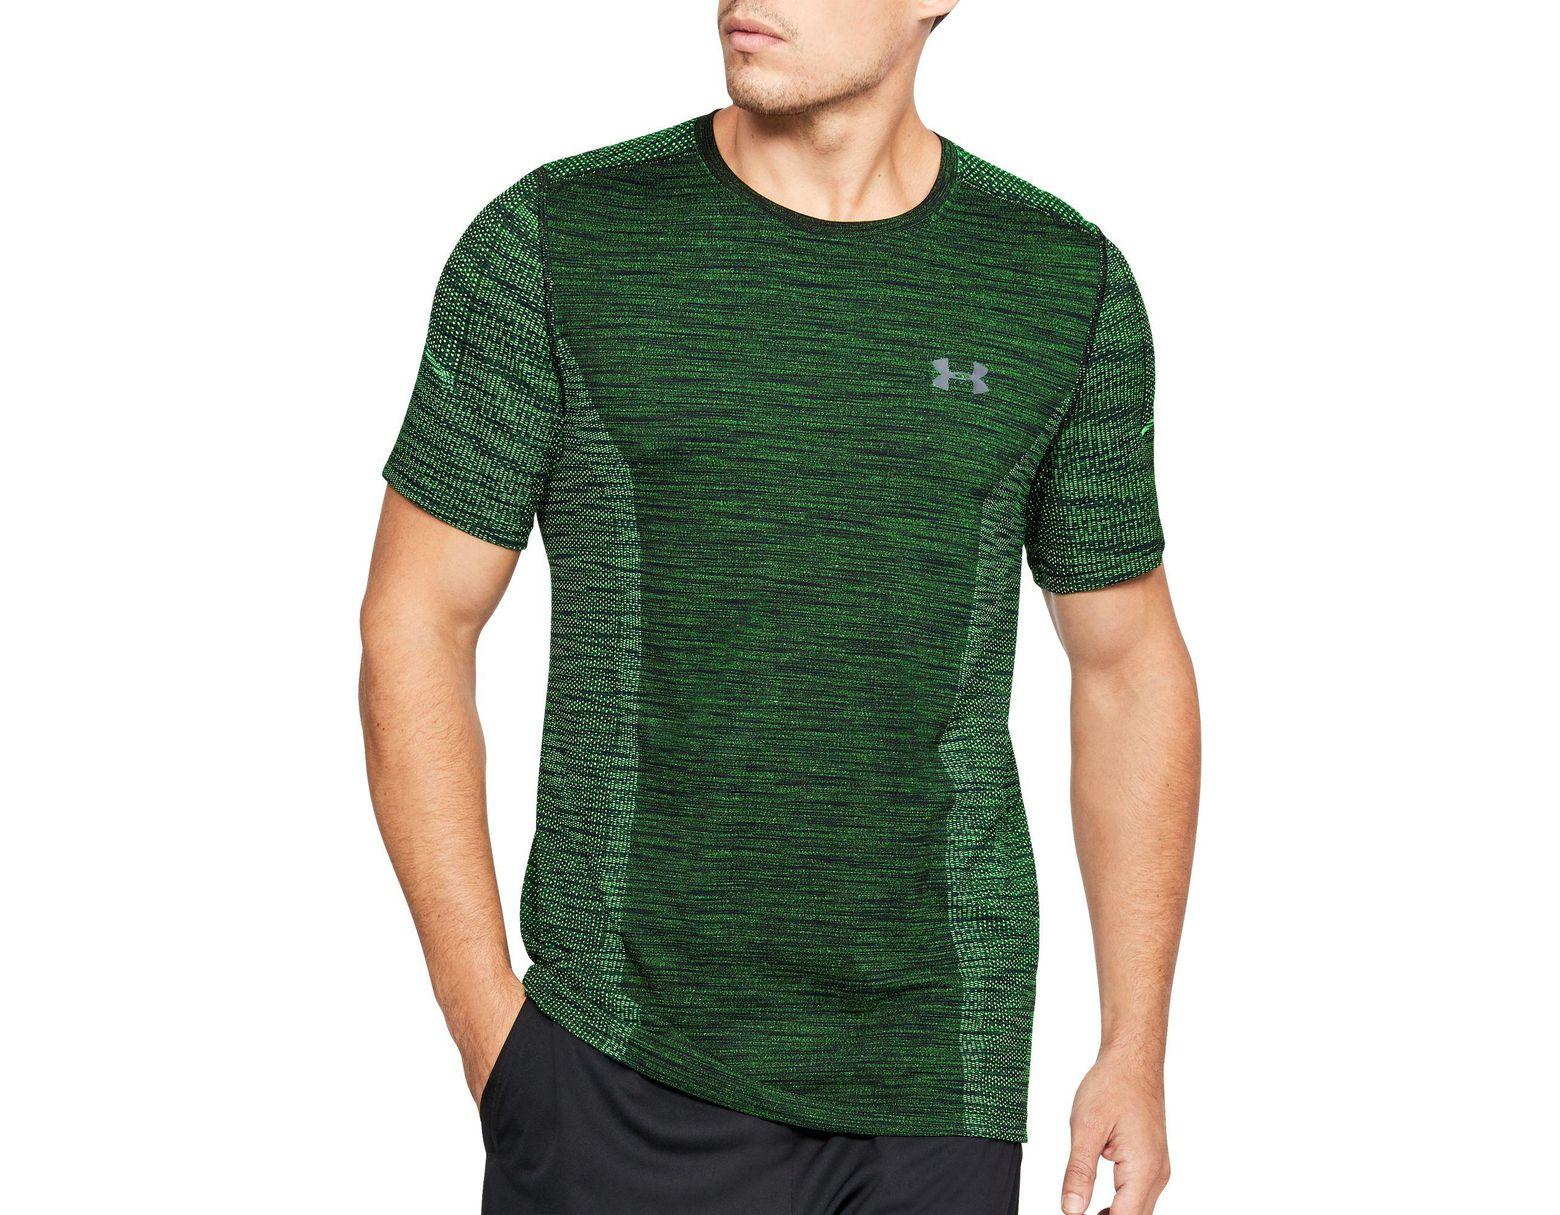 b83051910 Under Armour Threadborne Seamless T-shirt in Green for Men - Lyst